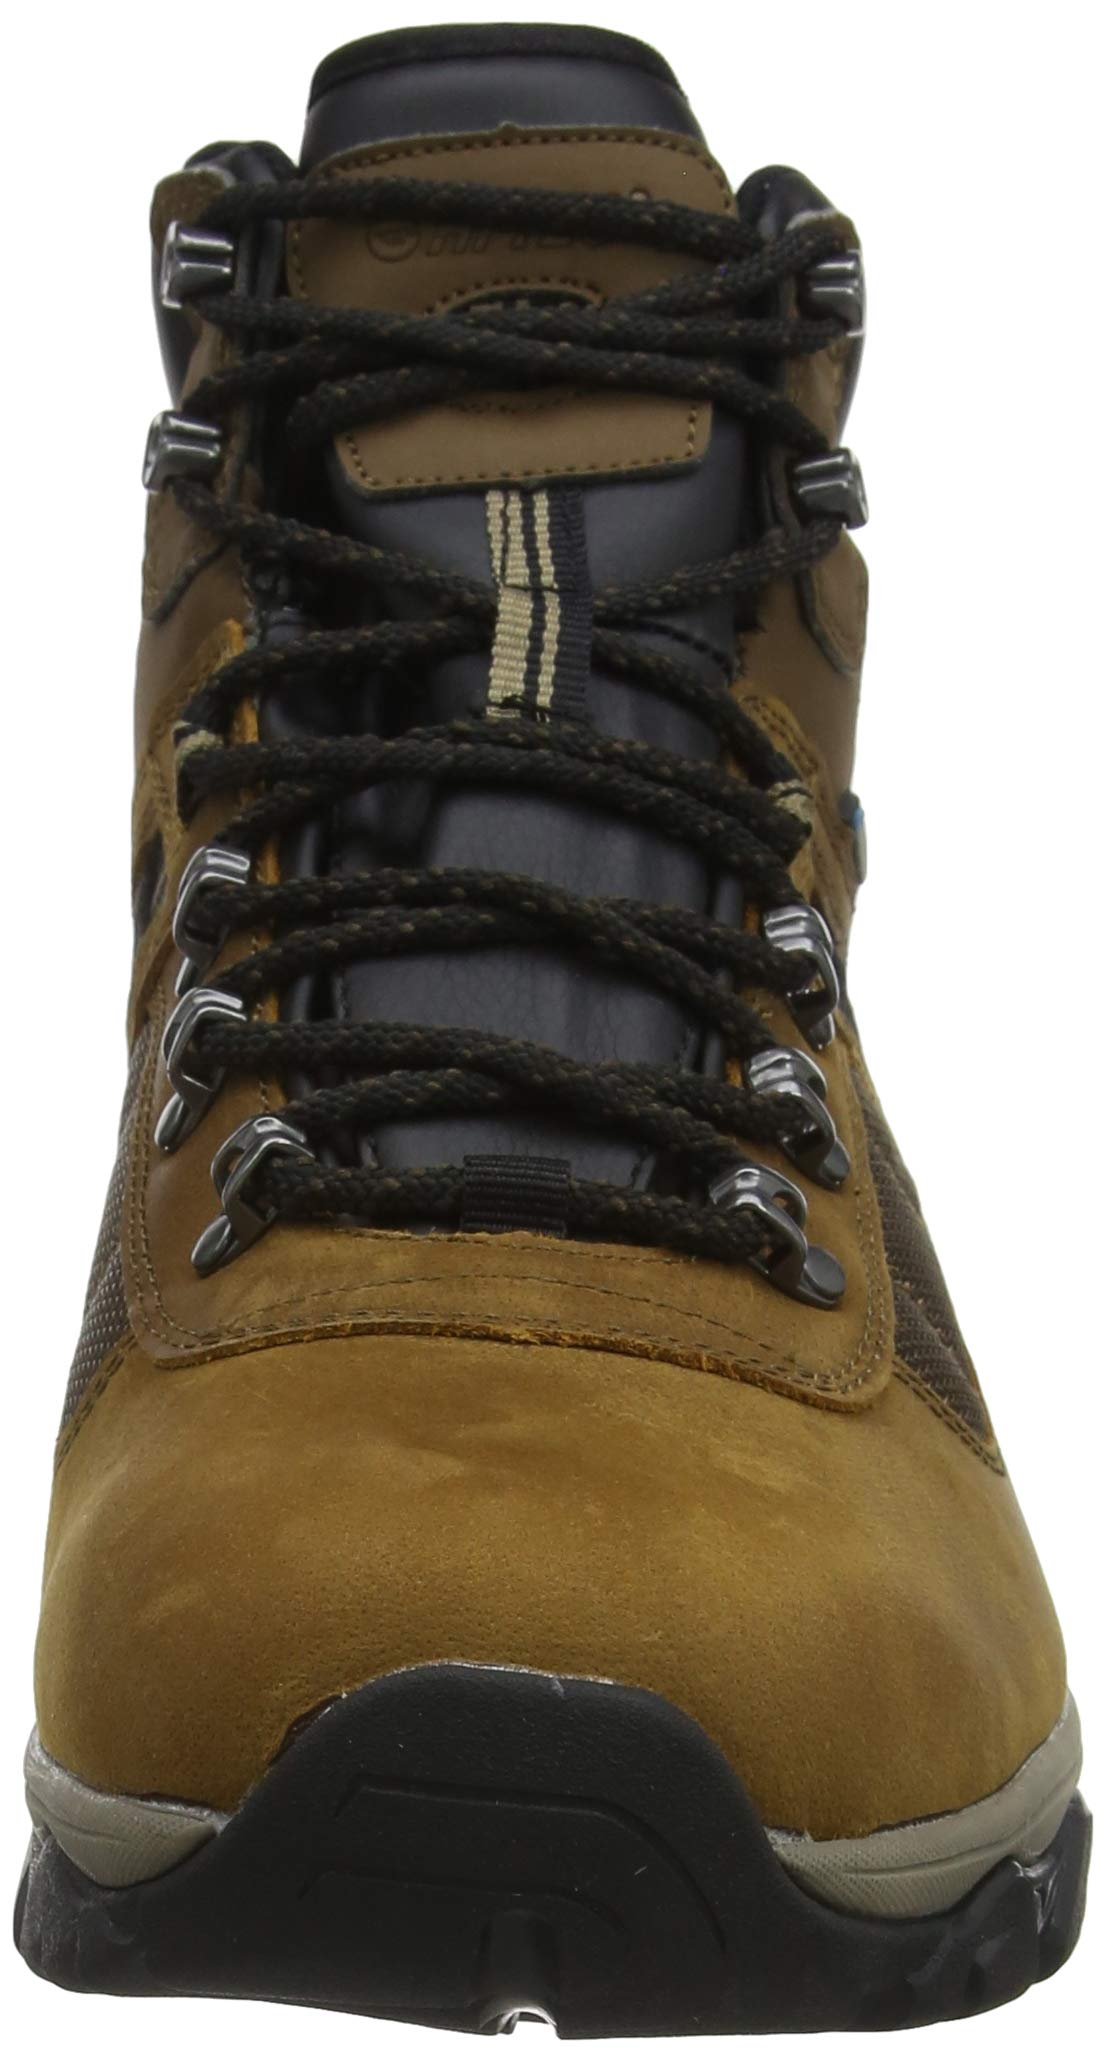 Hi-Tec Men's Ravus Quest Lux Mid Wp High Rise Hiking Boots 4